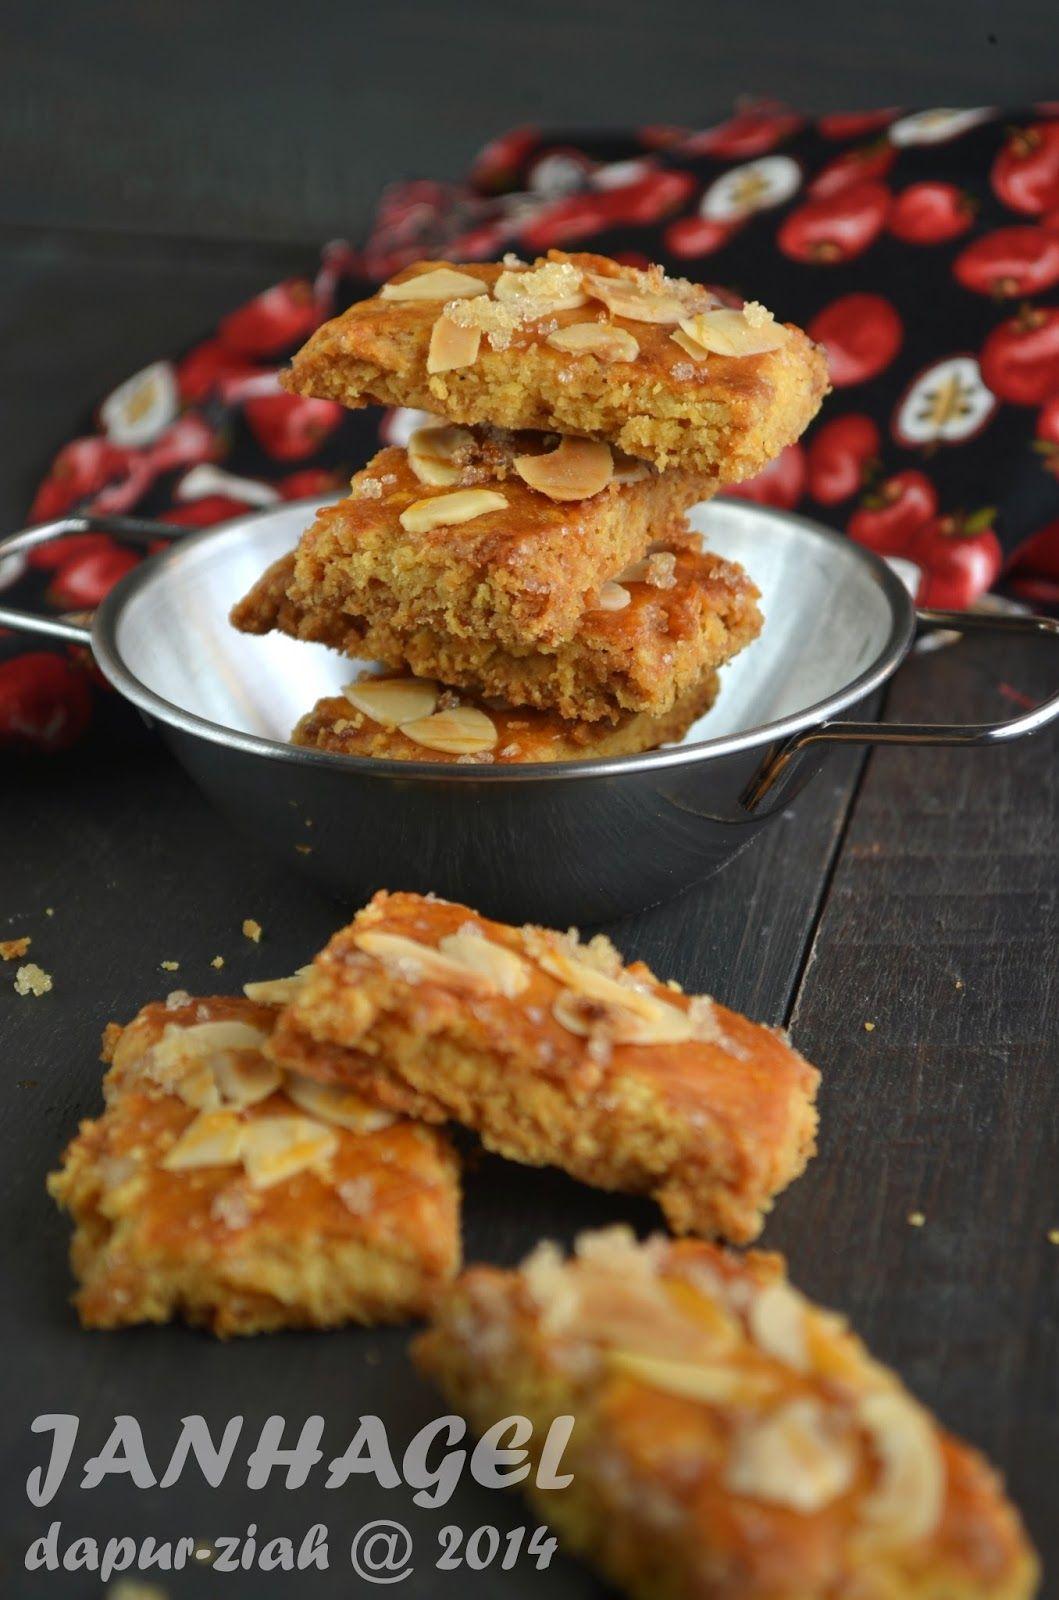 Assalamualaikum Moms Berhubung Sudah Hawa Hawa Mau Bulan Ramadhan Yang Punya Blog Semangatnya Bikin Co Makanan Dan Minuman Resep Biskuit Kue Kering Mentega